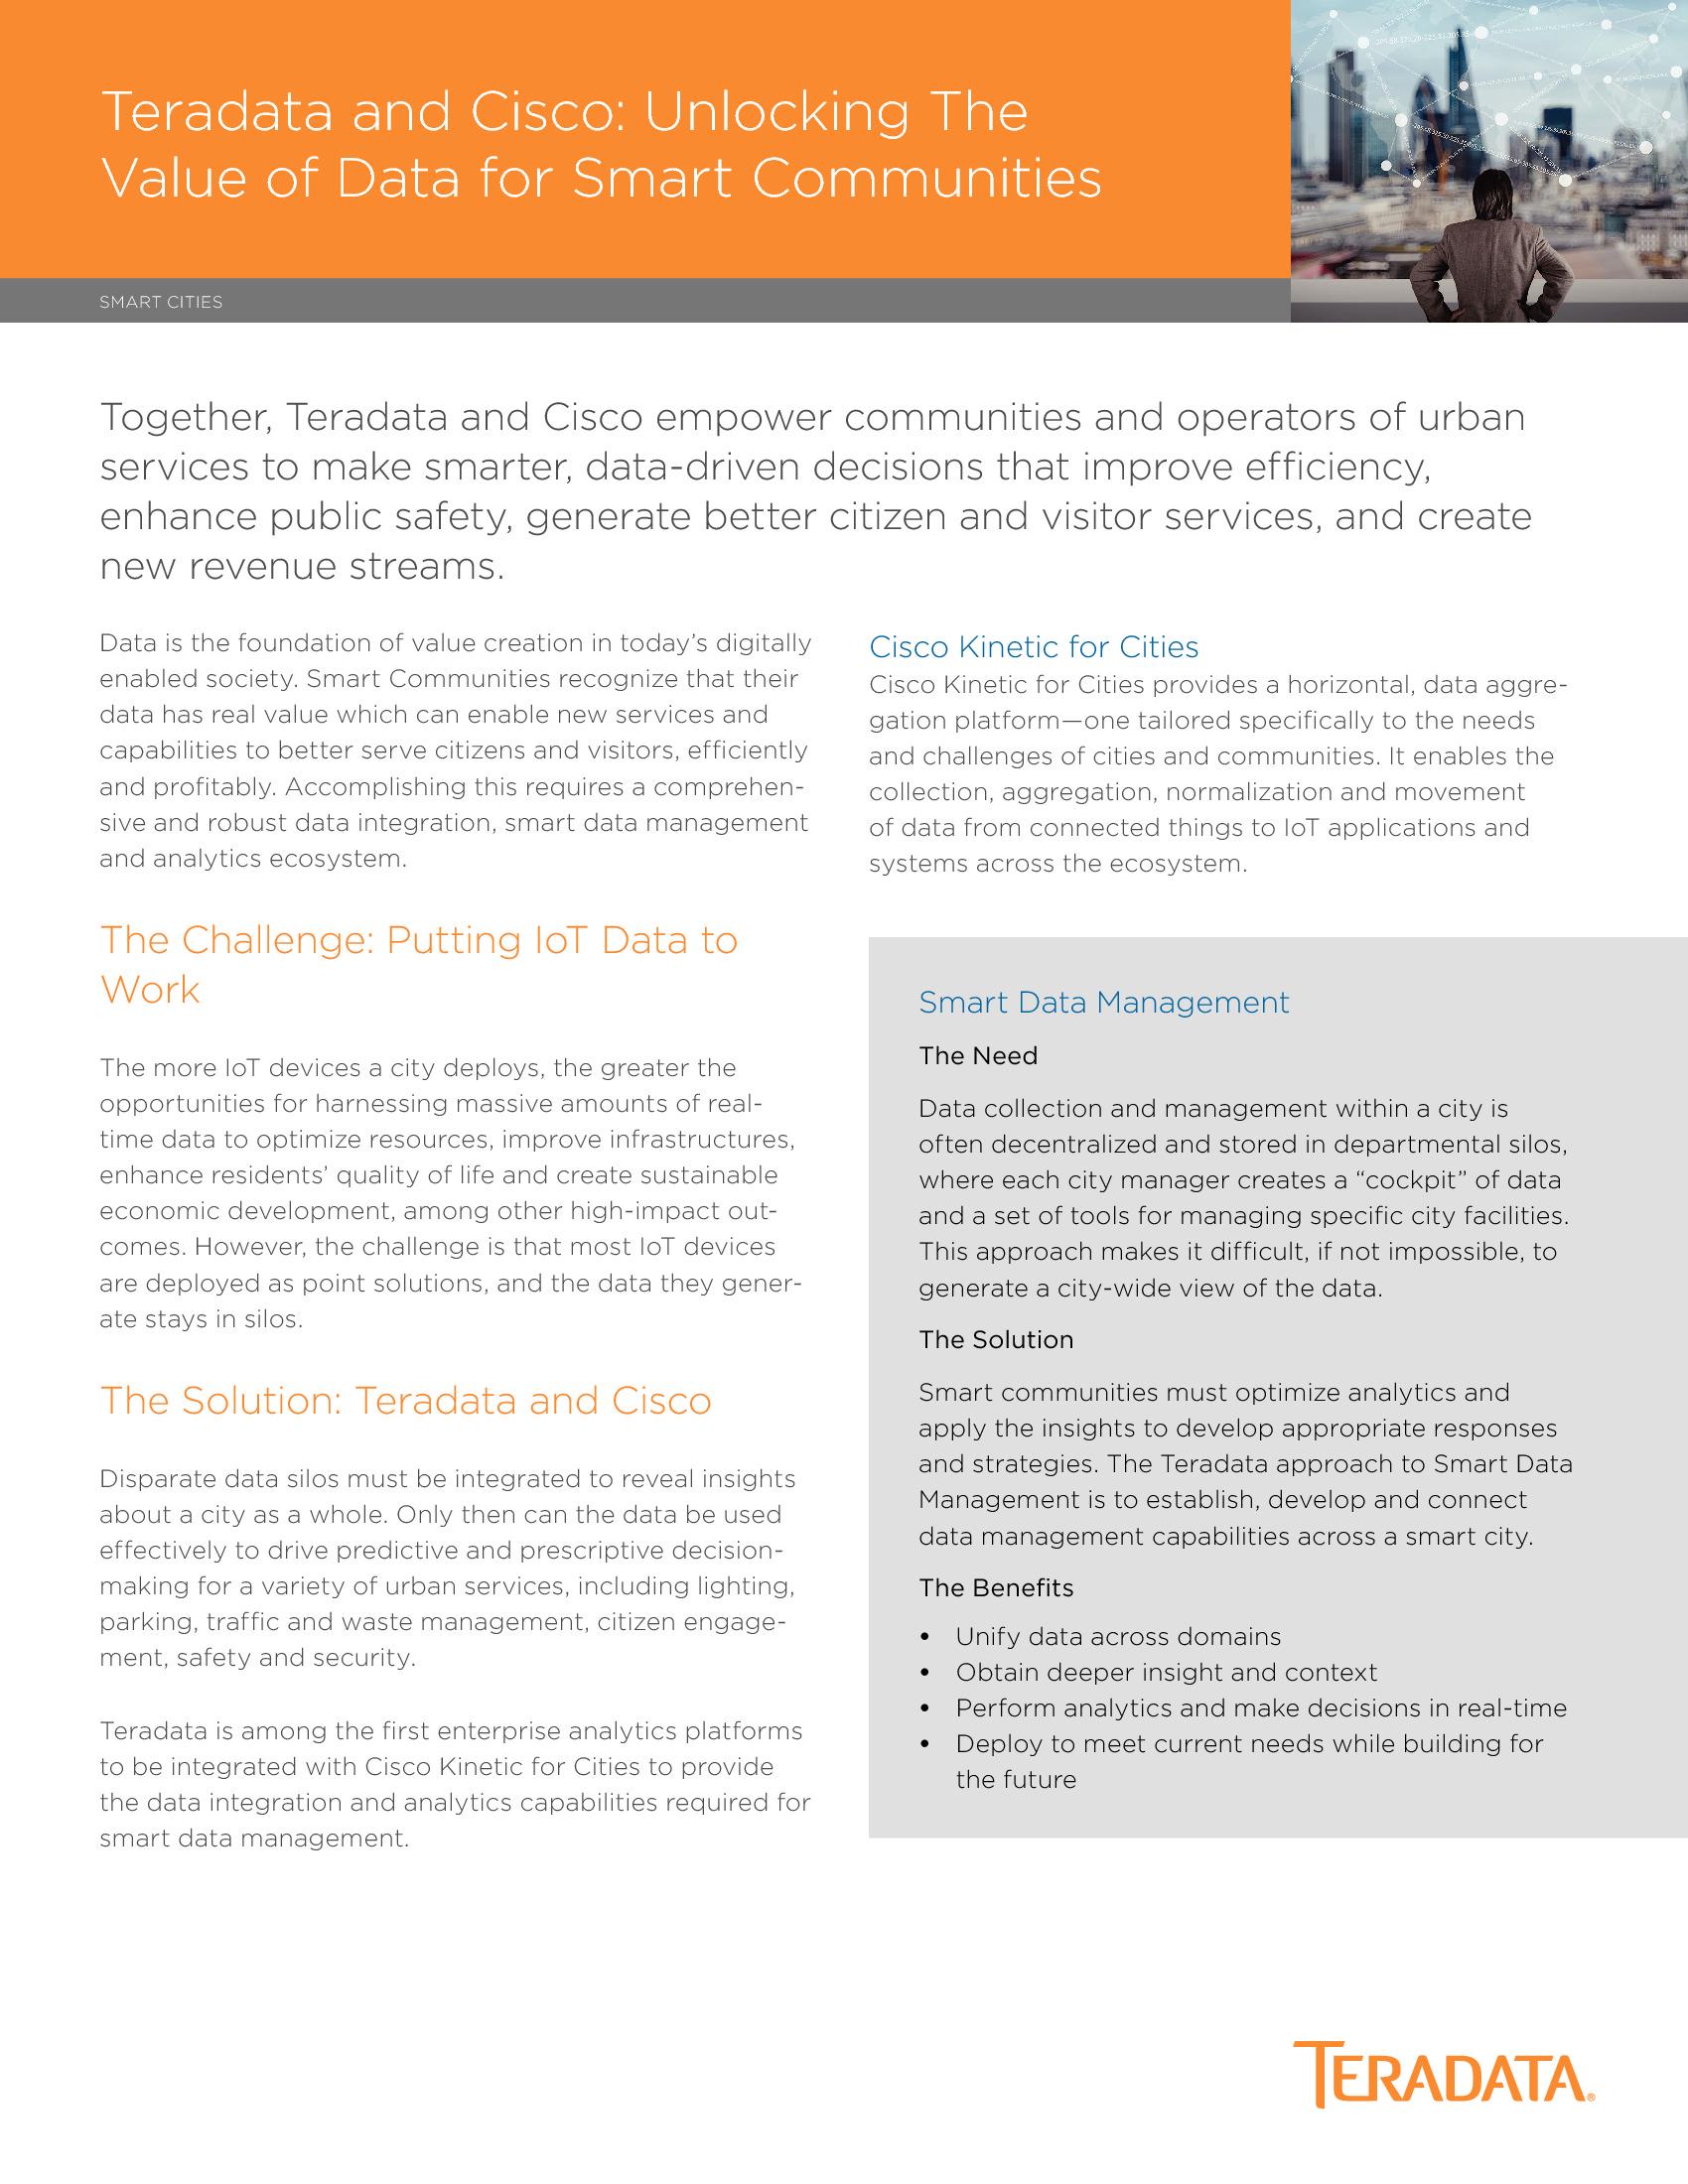 GT - Cisco - 2018 Channel Sponsorship - Unlocking The Value of Data